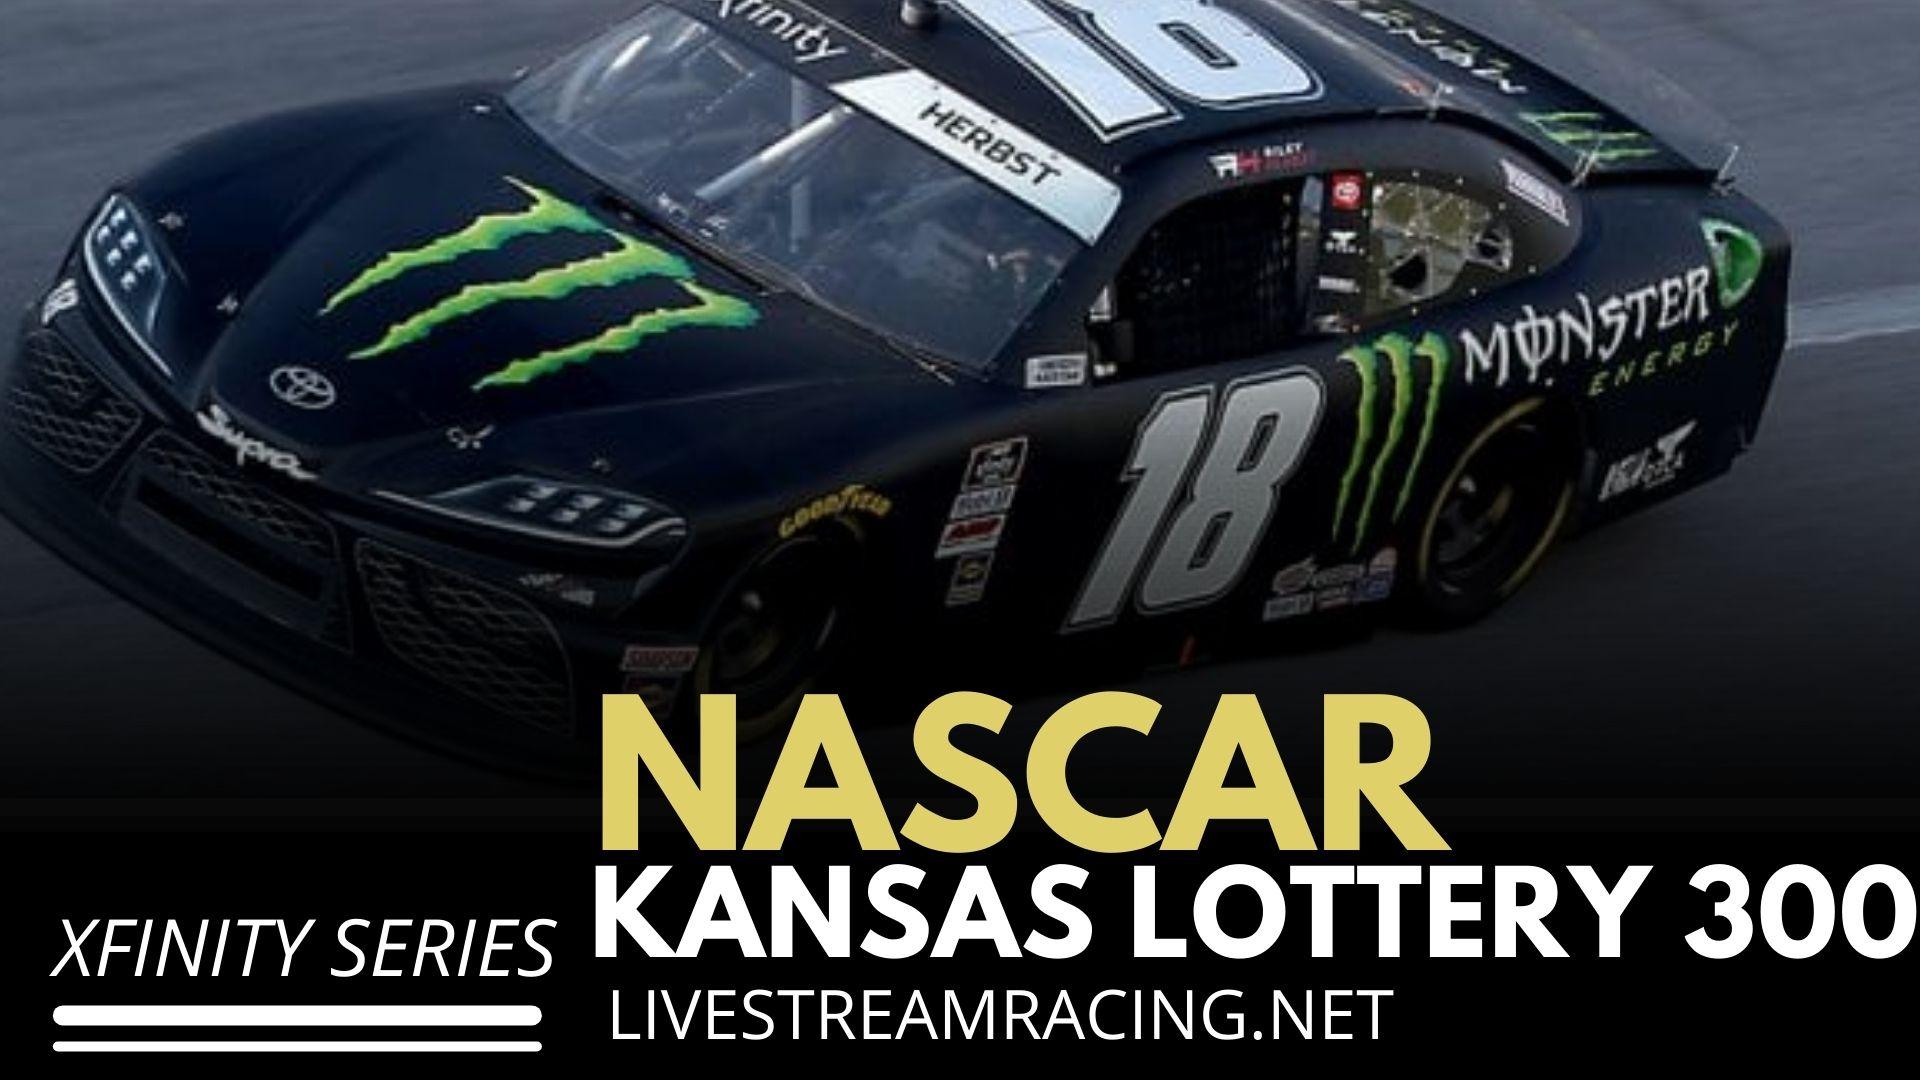 Nascar Kansas Lottery 300 Live Stream 2021 - Xfinity Series